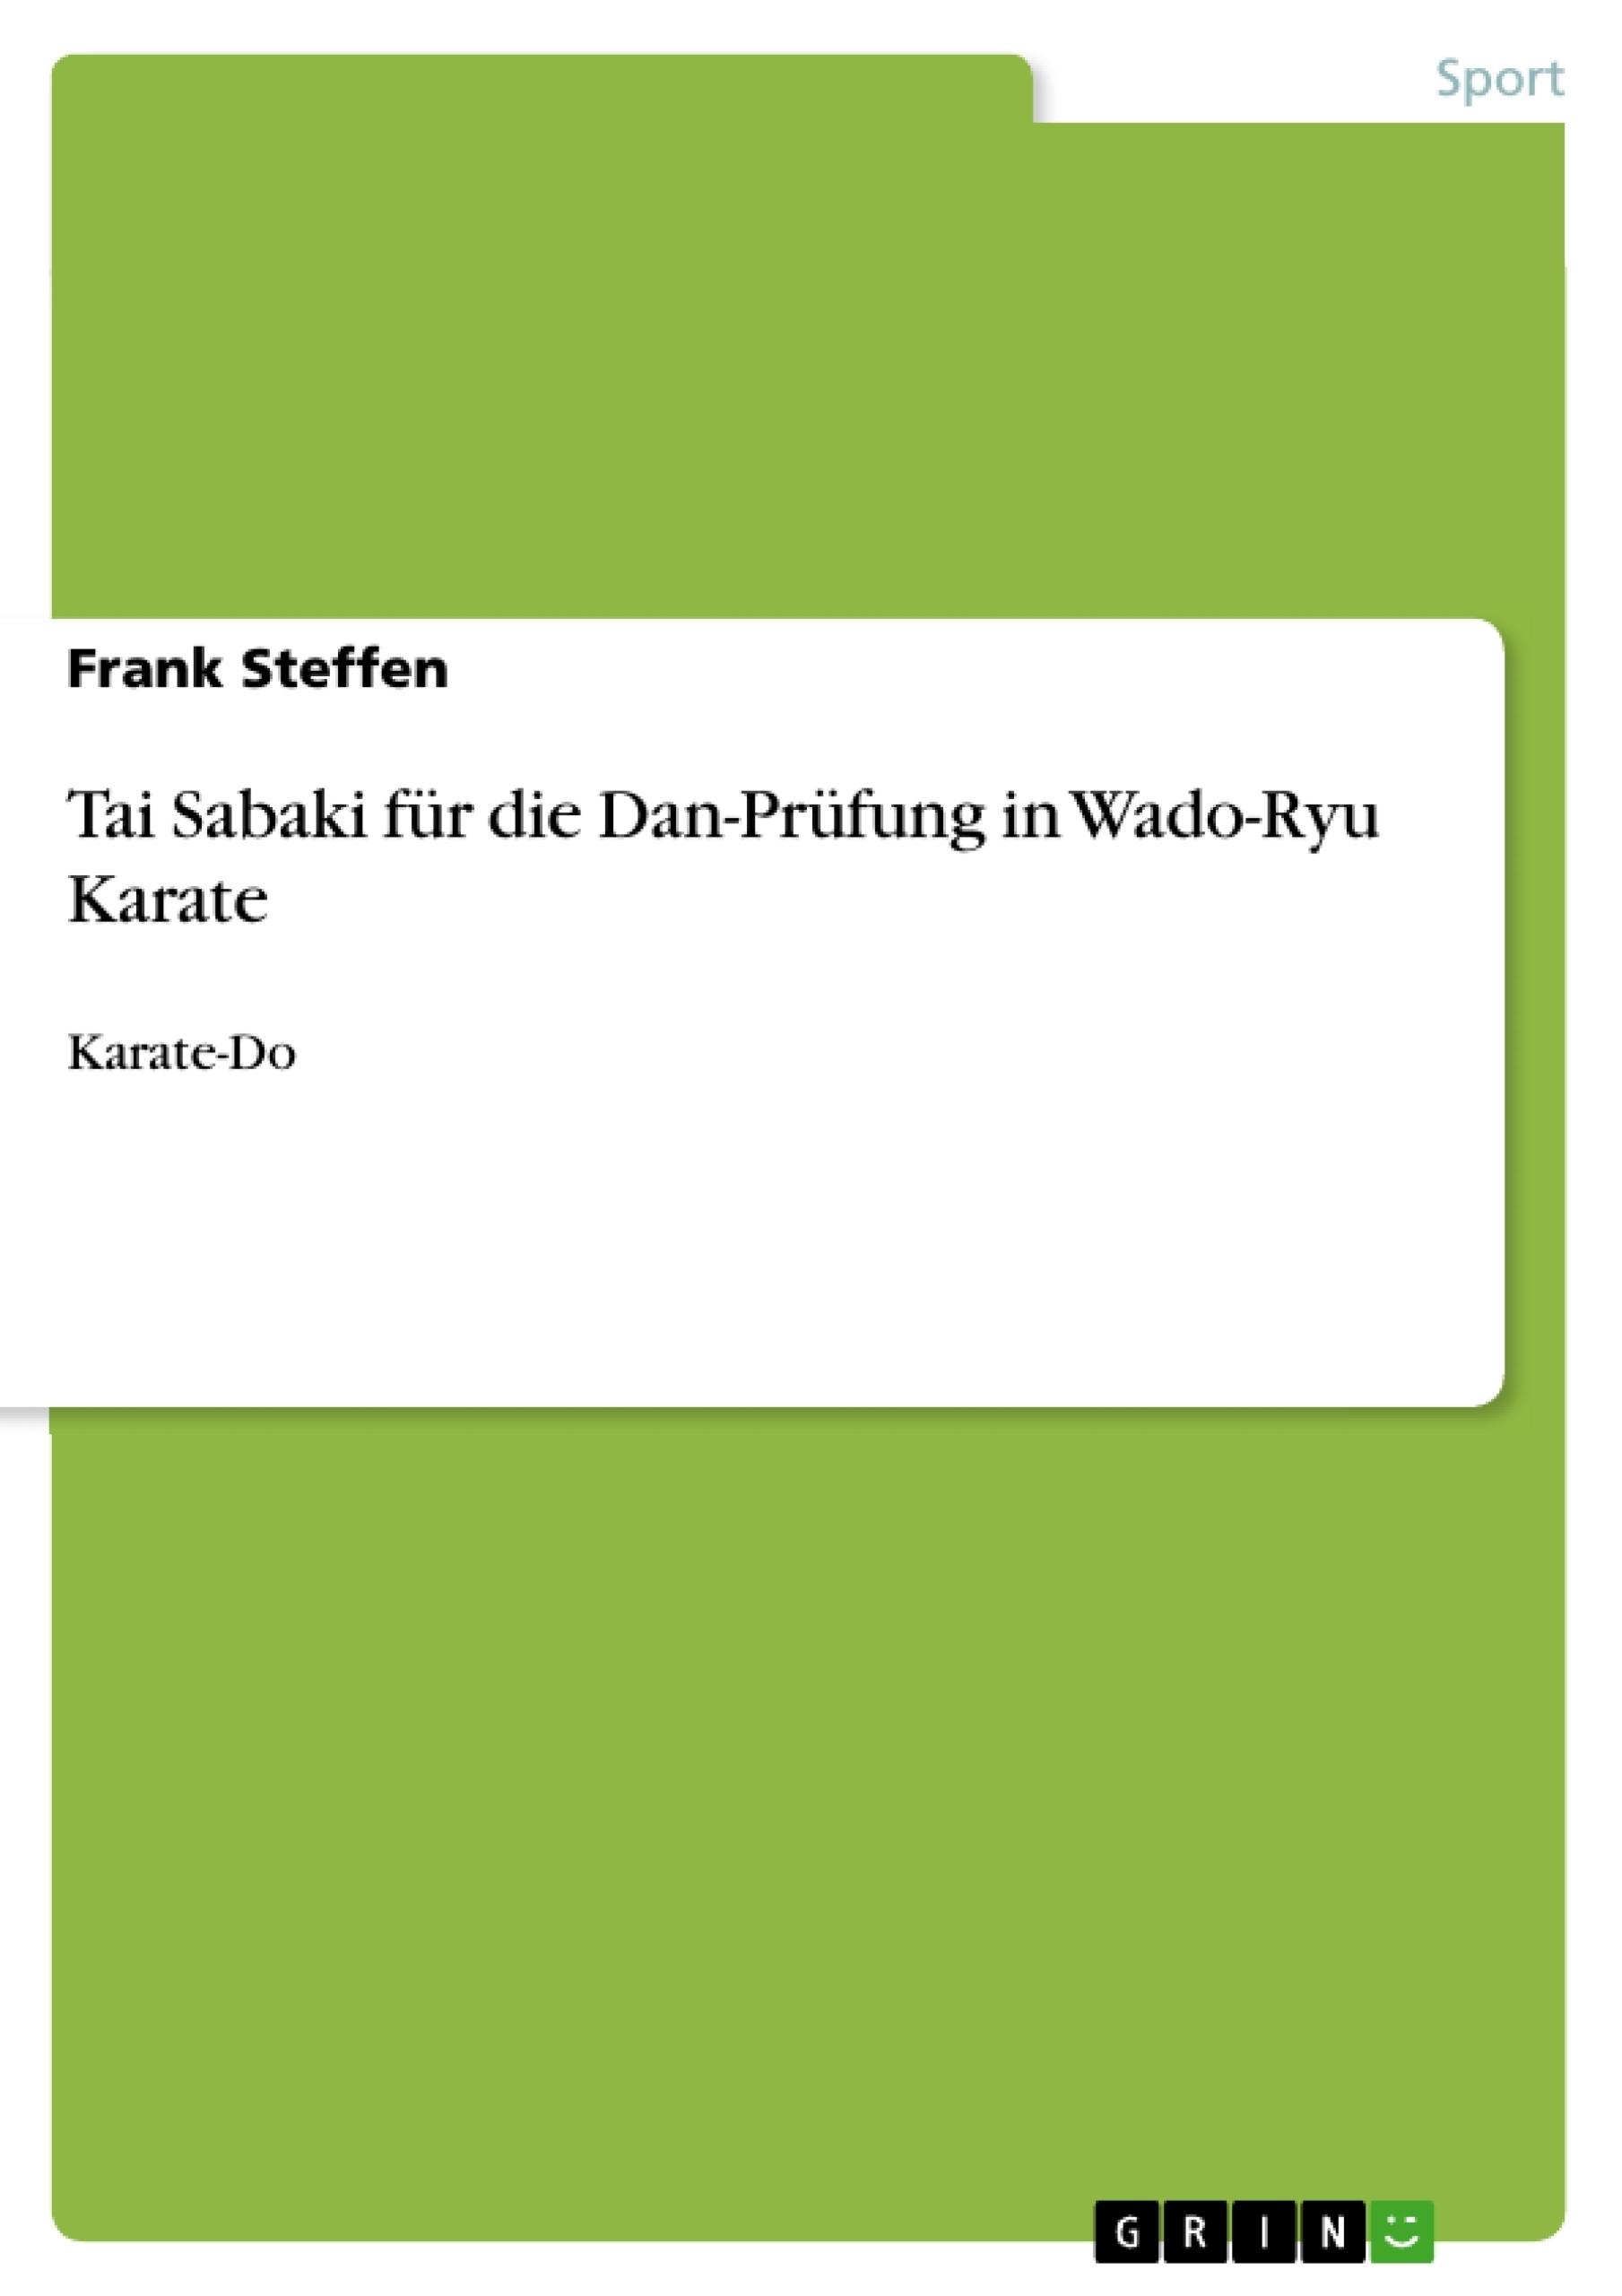 Titel: Tai Sabaki für die Dan-Prüfung in Wado-Ryu Karate